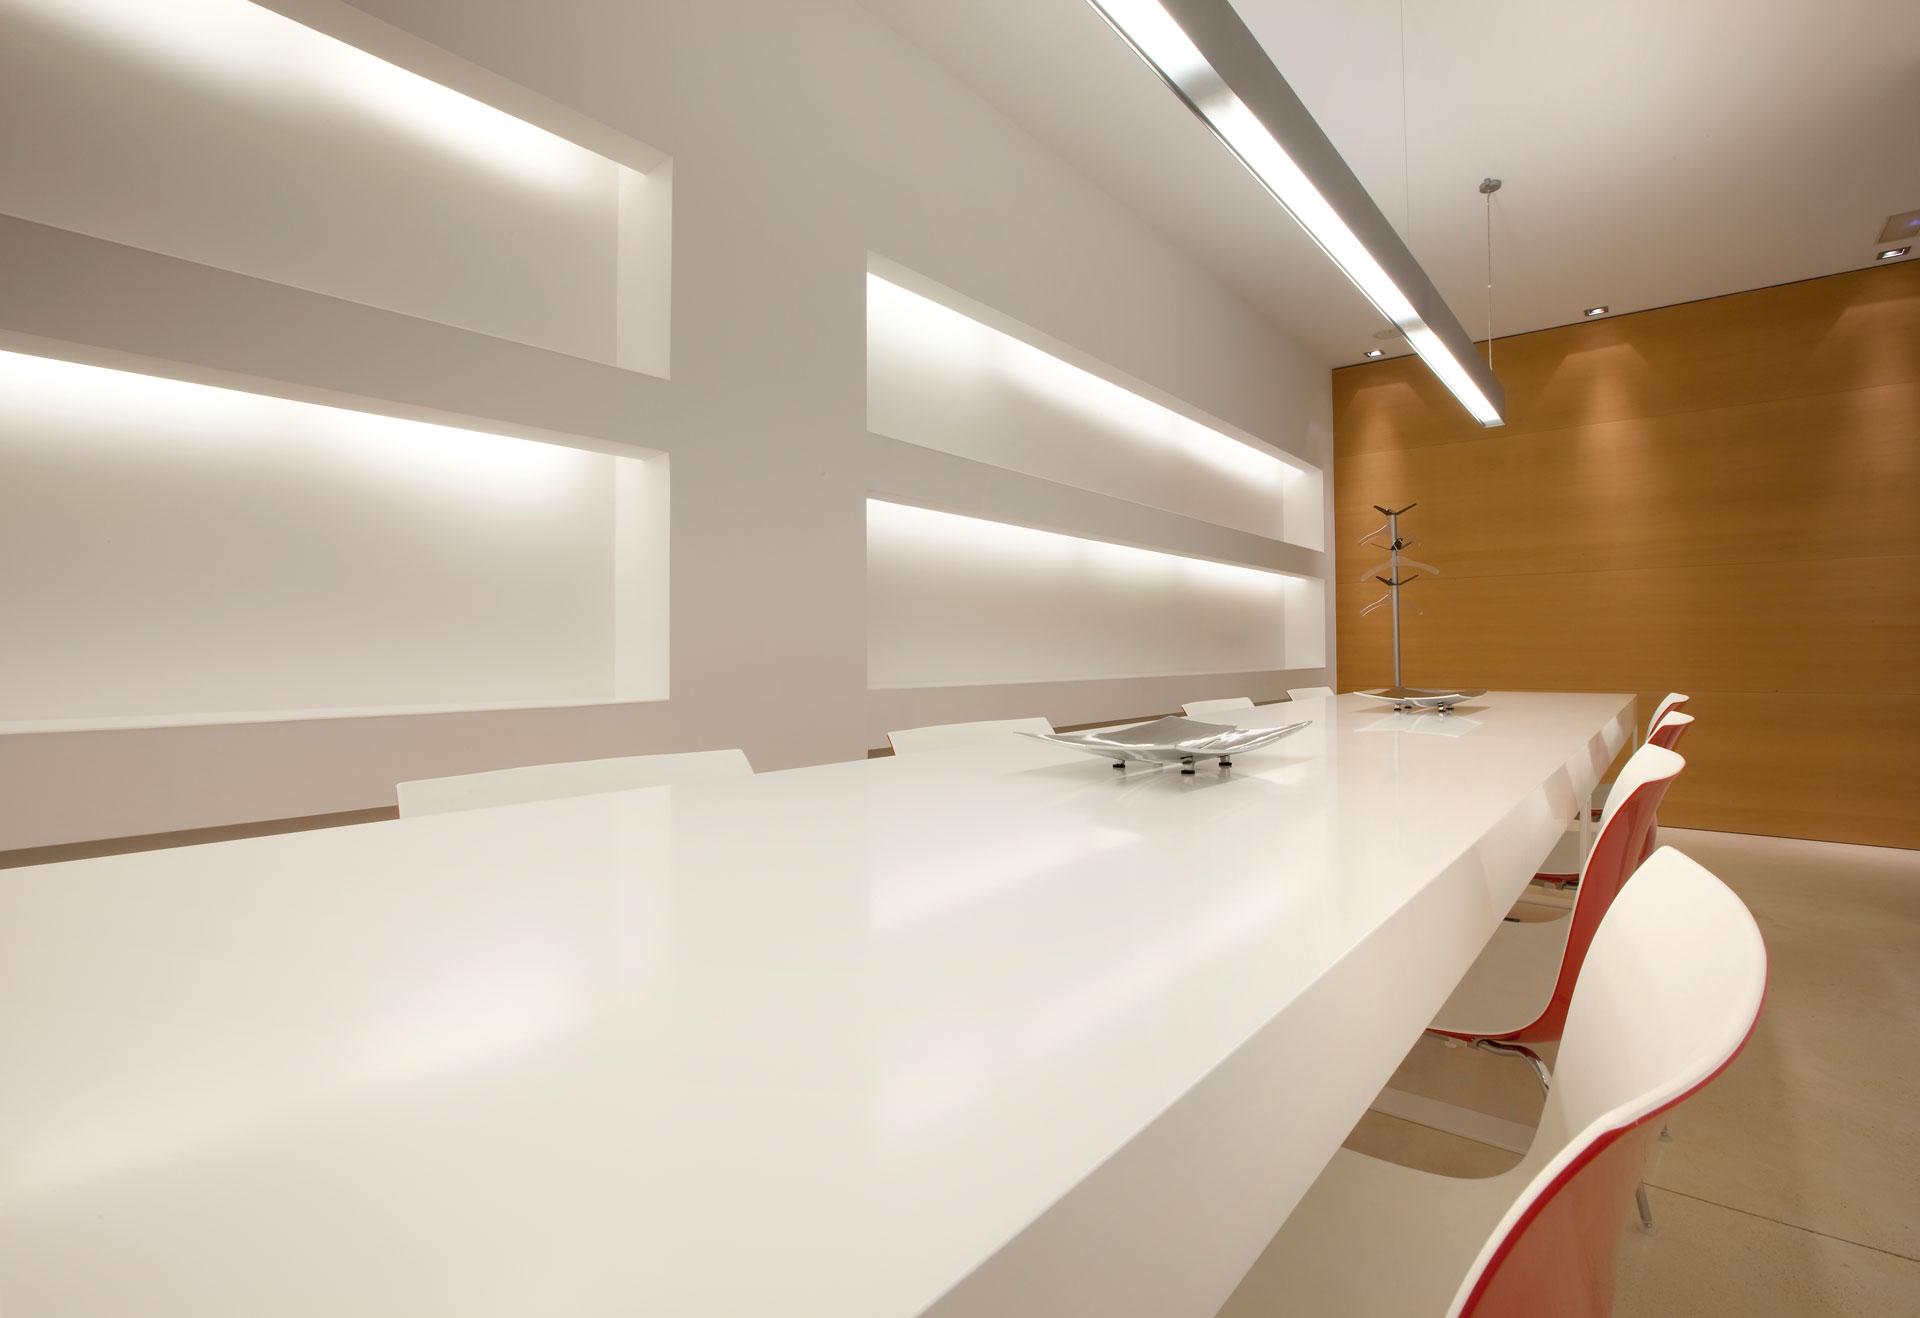 Oficinas Urbaestilo – Tomas Amat estudio de arquitectura